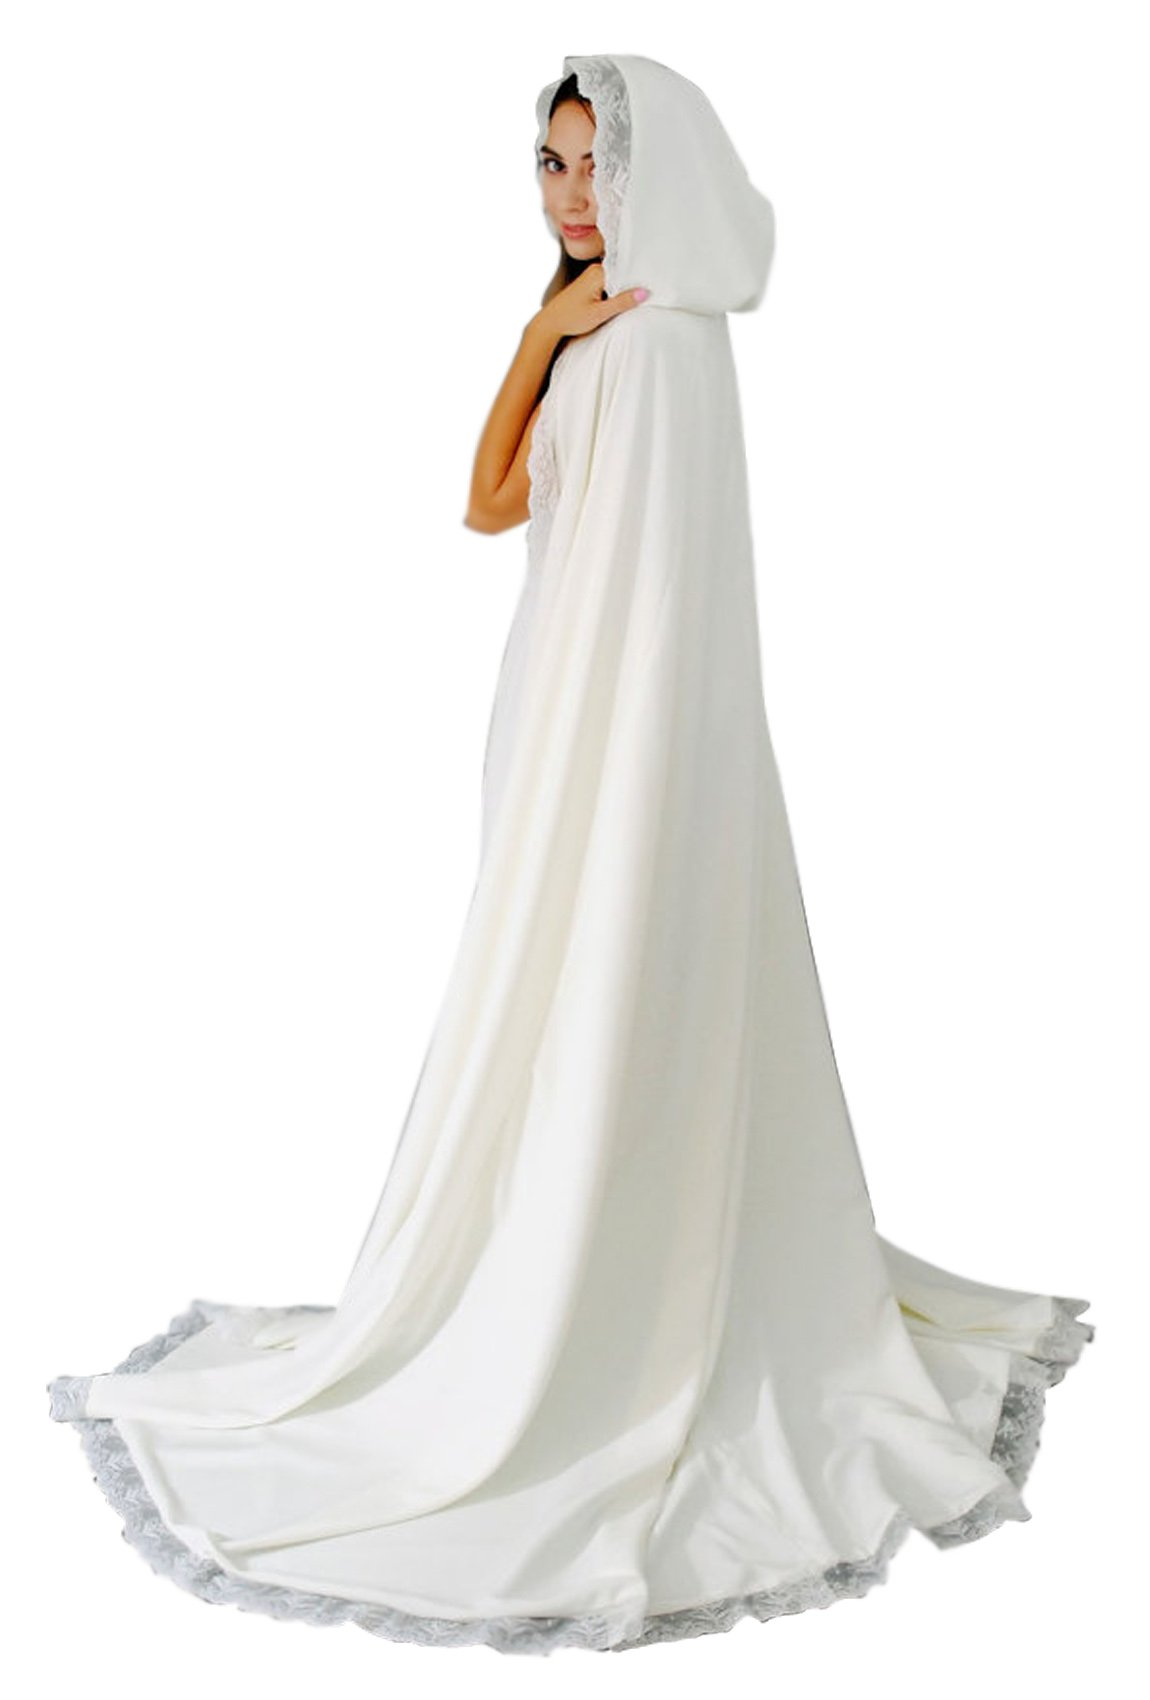 Women's Long Wedding Cape Hooded Cloak for Bride Lace Edge (White)